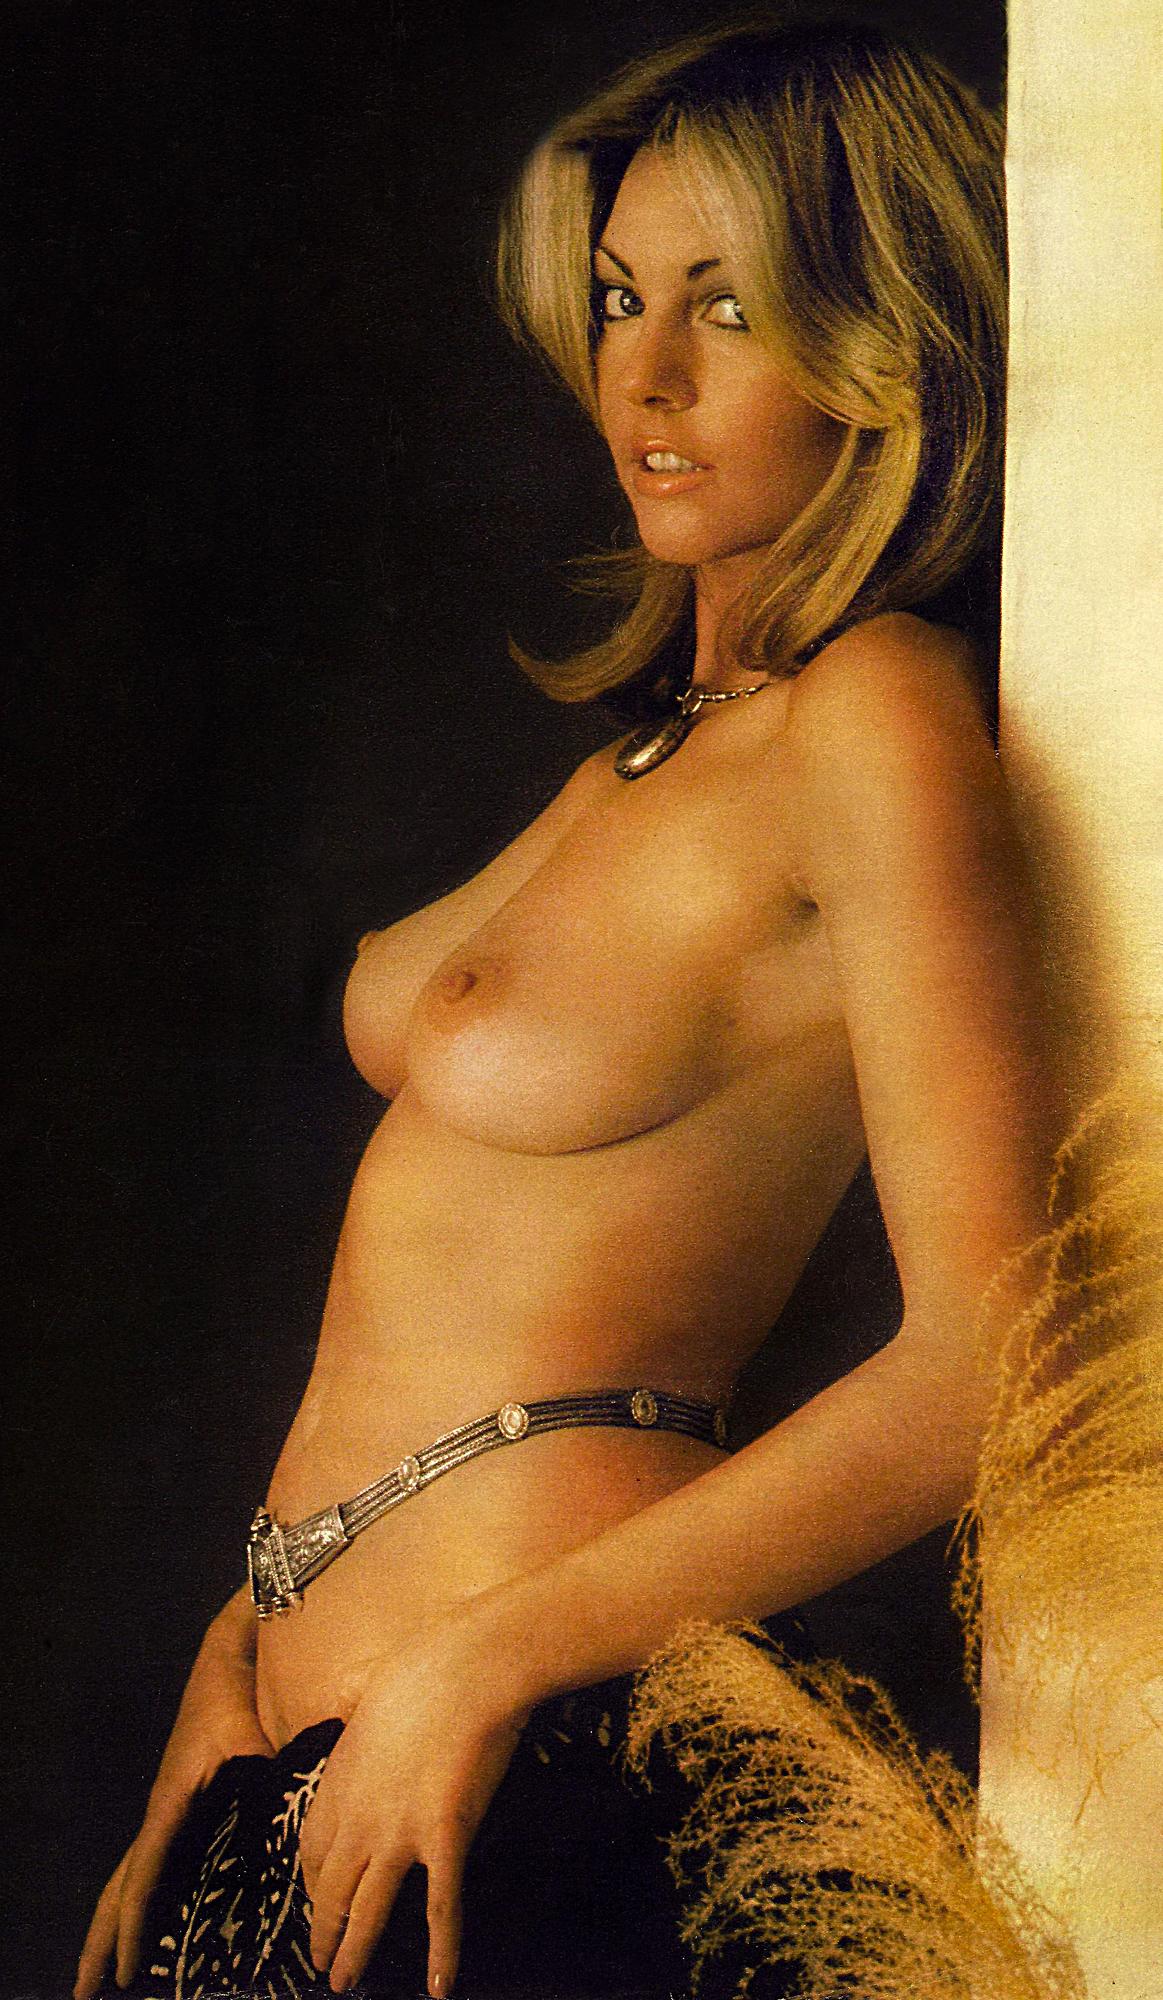 gillian-duxbury-ritz-magazine-1975